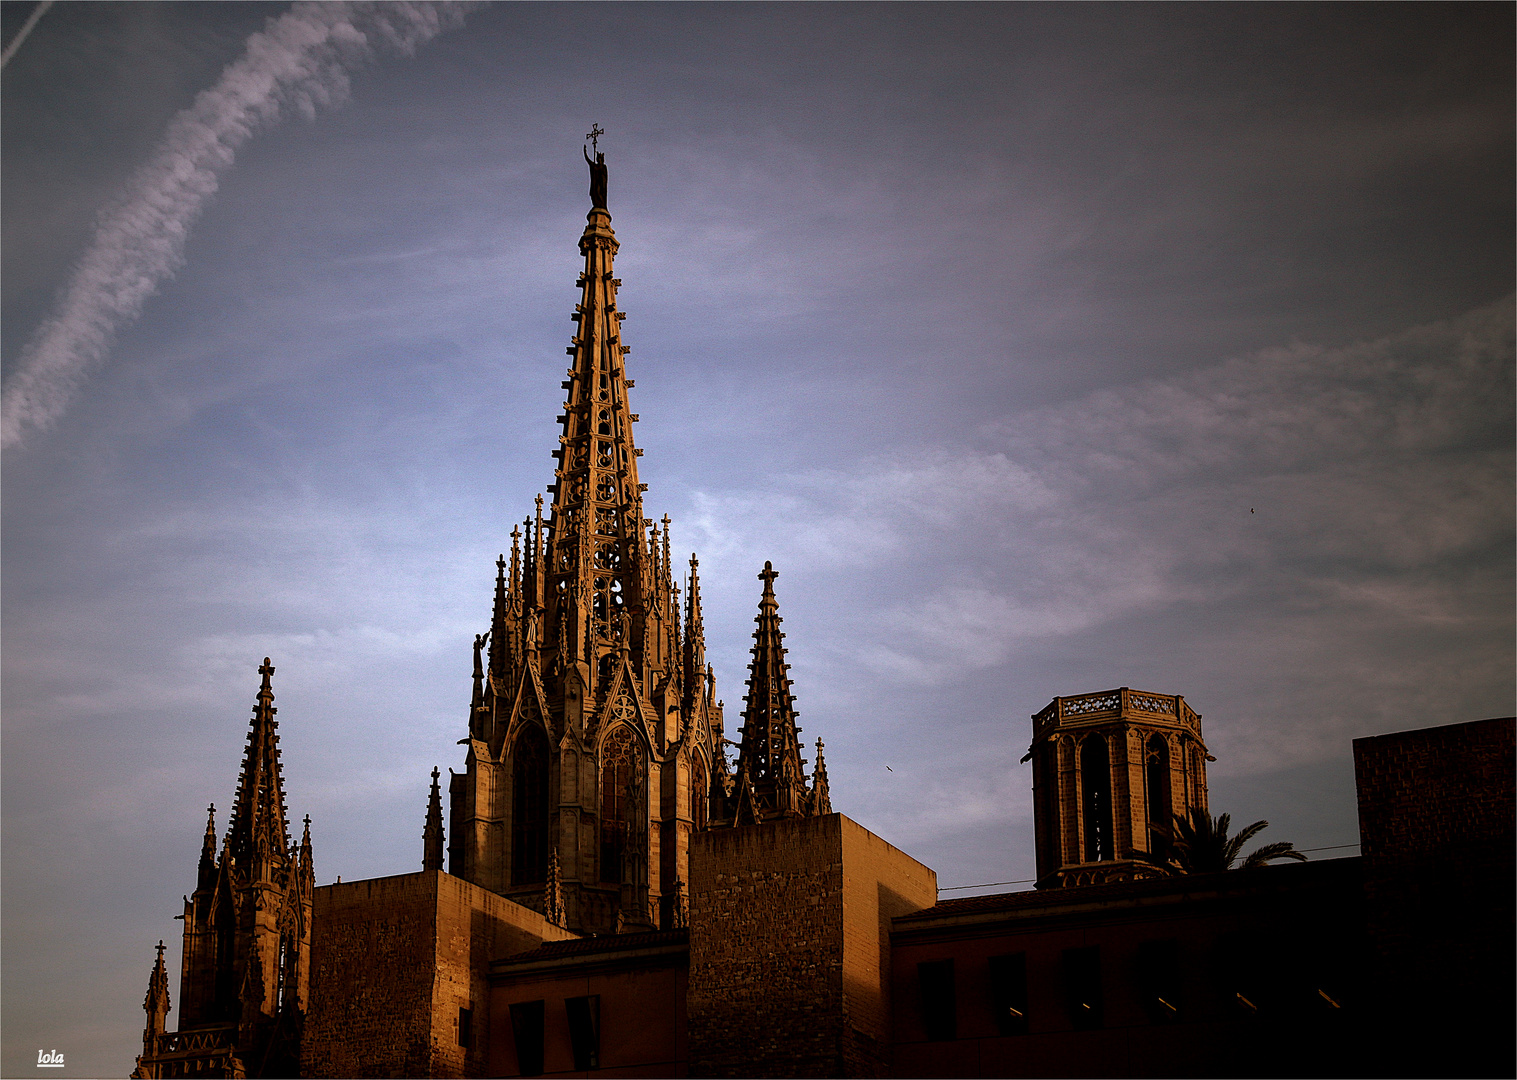 ...detalle de la catedral de Barcelona...